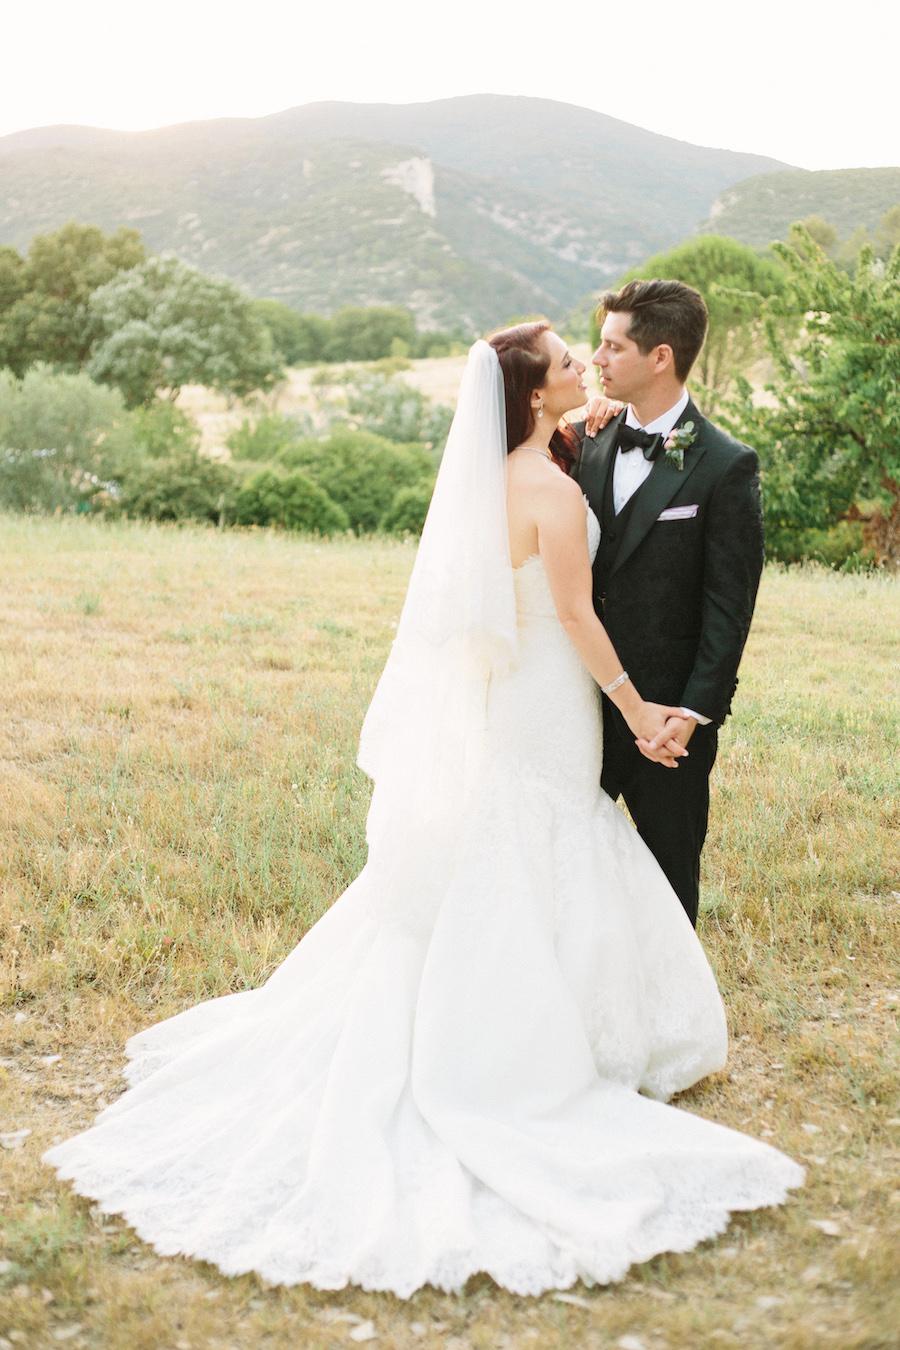 saya-photography-jewish-wedding-provence-rustic-lourmarin-le-galinier-45.jpg